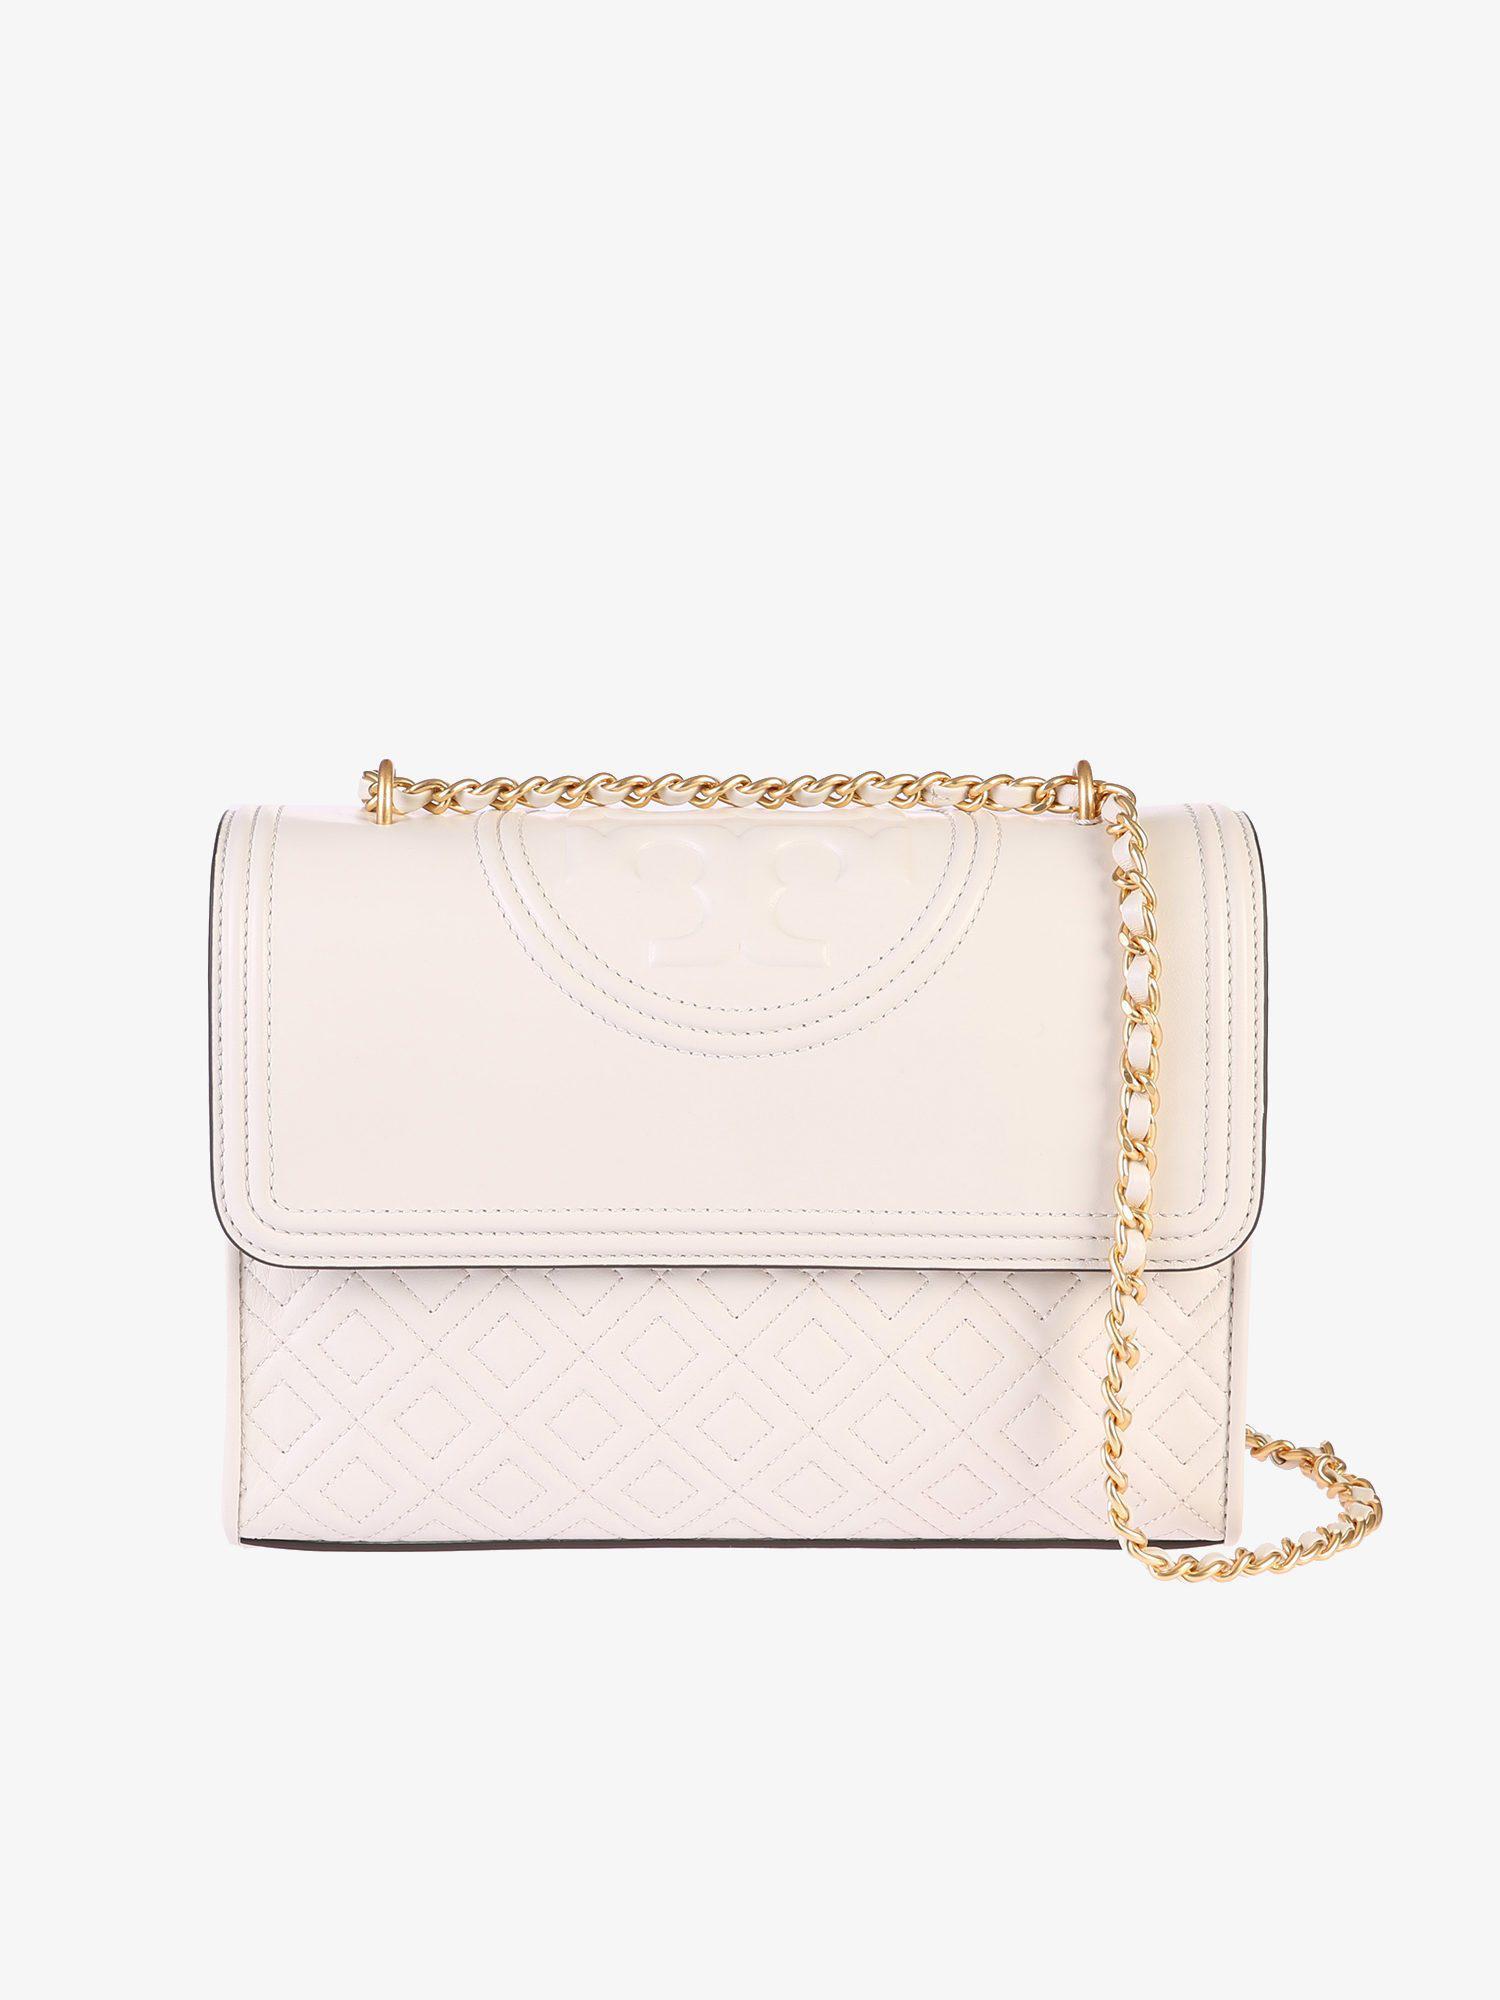 404345673bd2 Tory Burch. Women s Fleming Leather Shoulder Bag